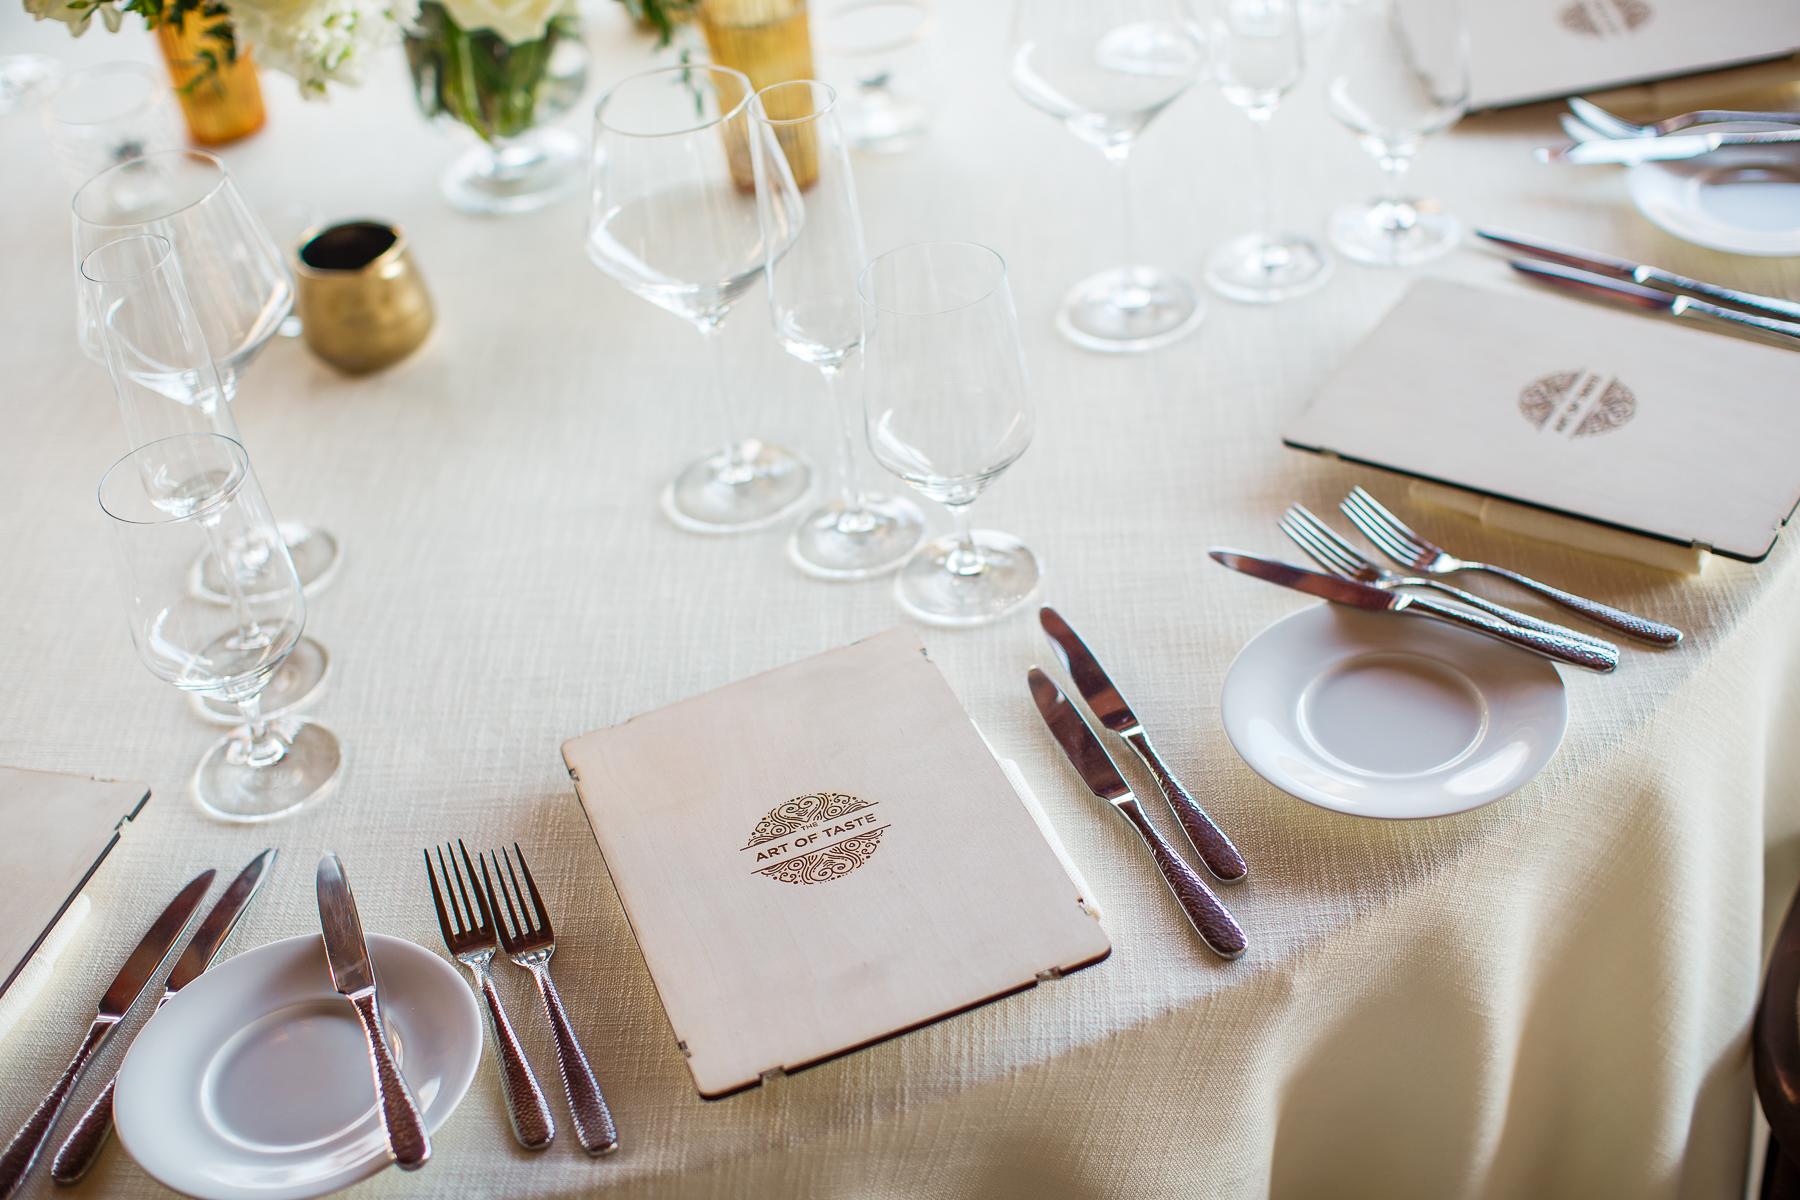 29.10.16 Art of Taste. Gala Dinner. Julieta Amezcua Cabo Wedding Photography.  (10 of 183).jpg